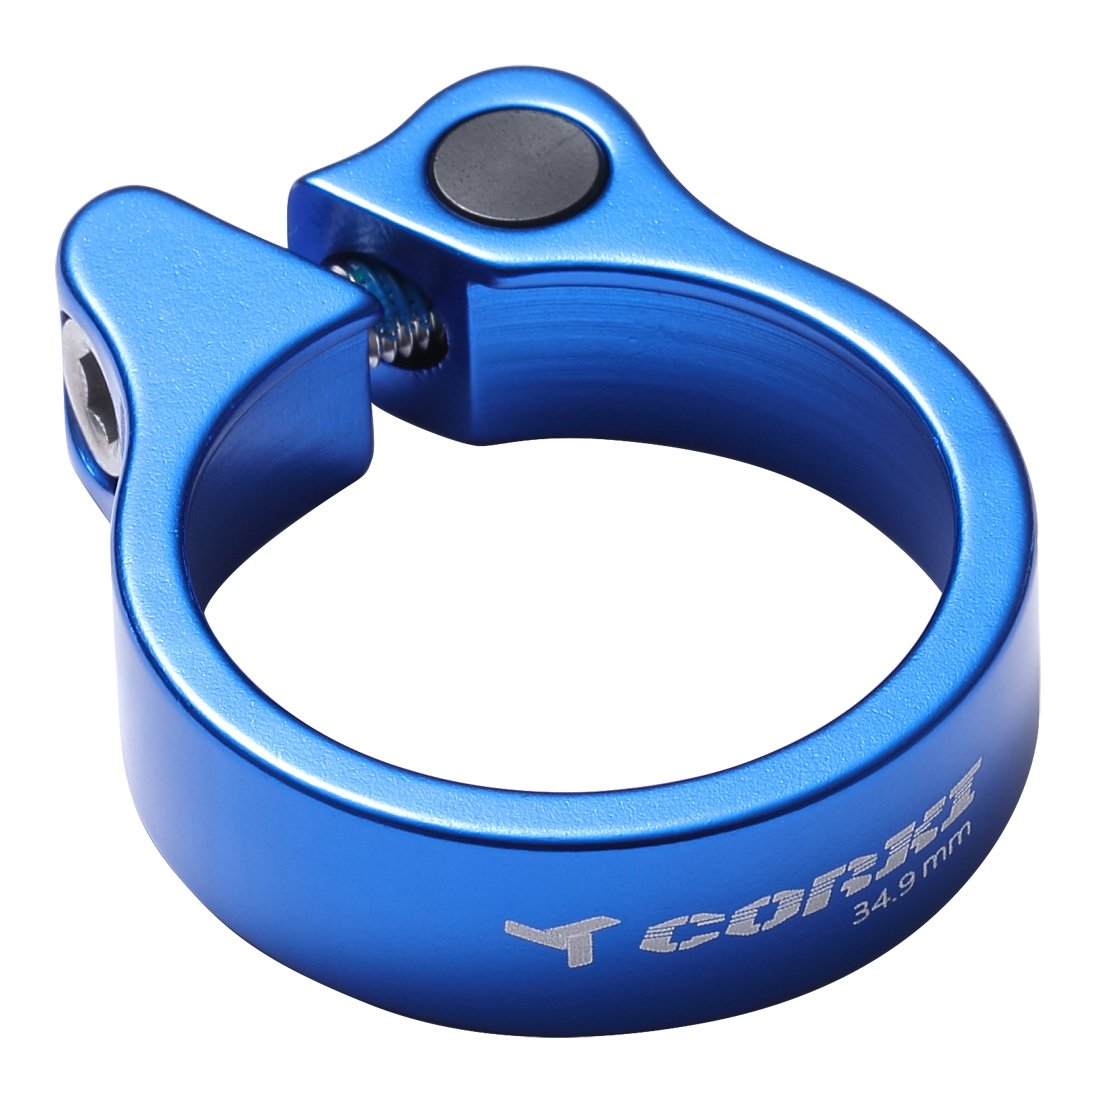 Corki Bicicleta Tija de Sill/ín Abrazadera Superficie Anodizada con Pulido a Chorro de Arena31.8mm//34.9mm Negro//Rojo//Azul